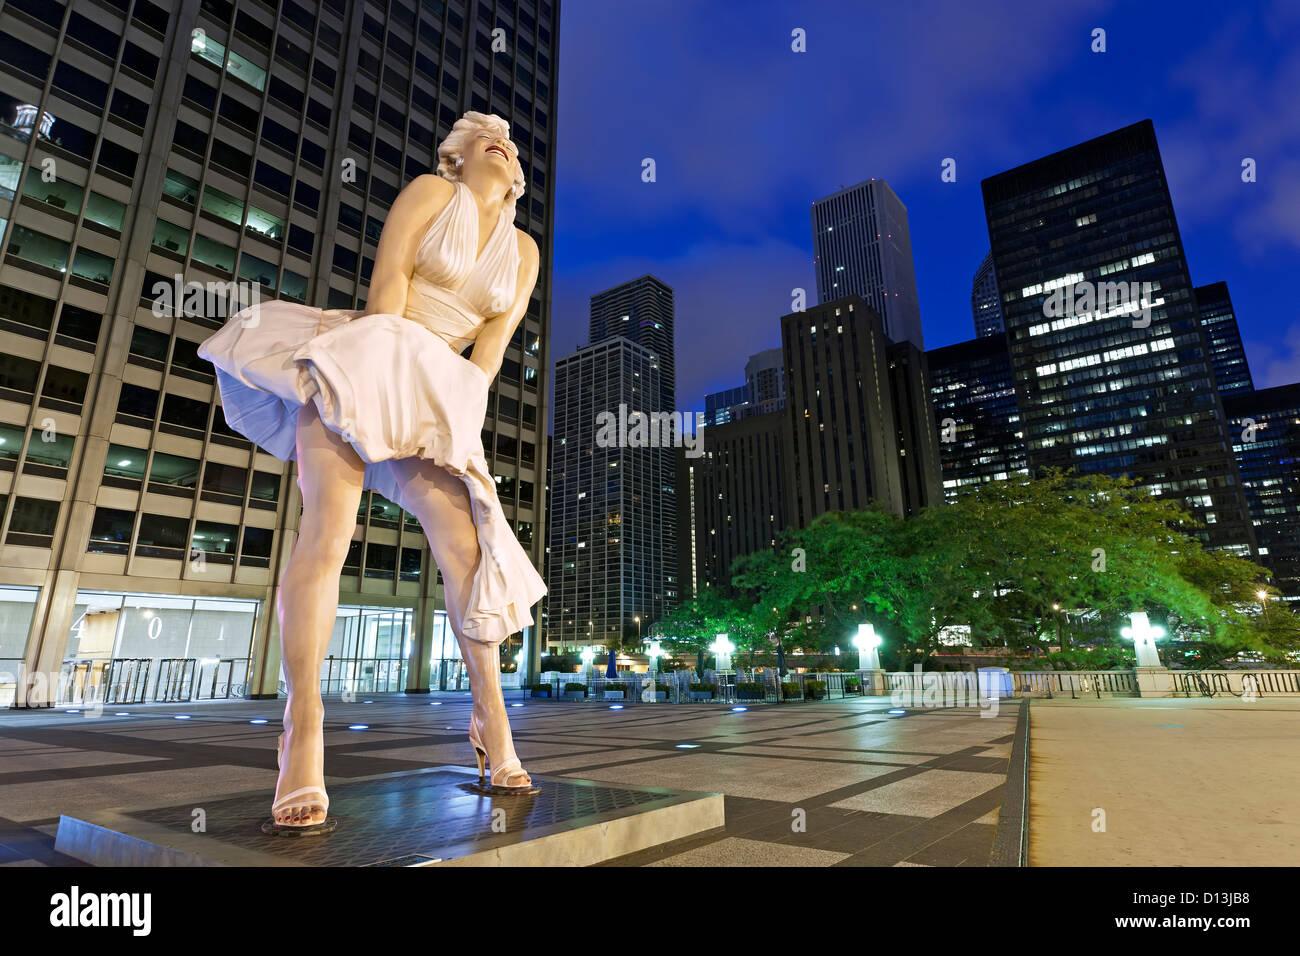 'Forever Marilyn' [Monroe] sculpture (by Seward Johnson), Chicago, Illinois USA - Stock Image